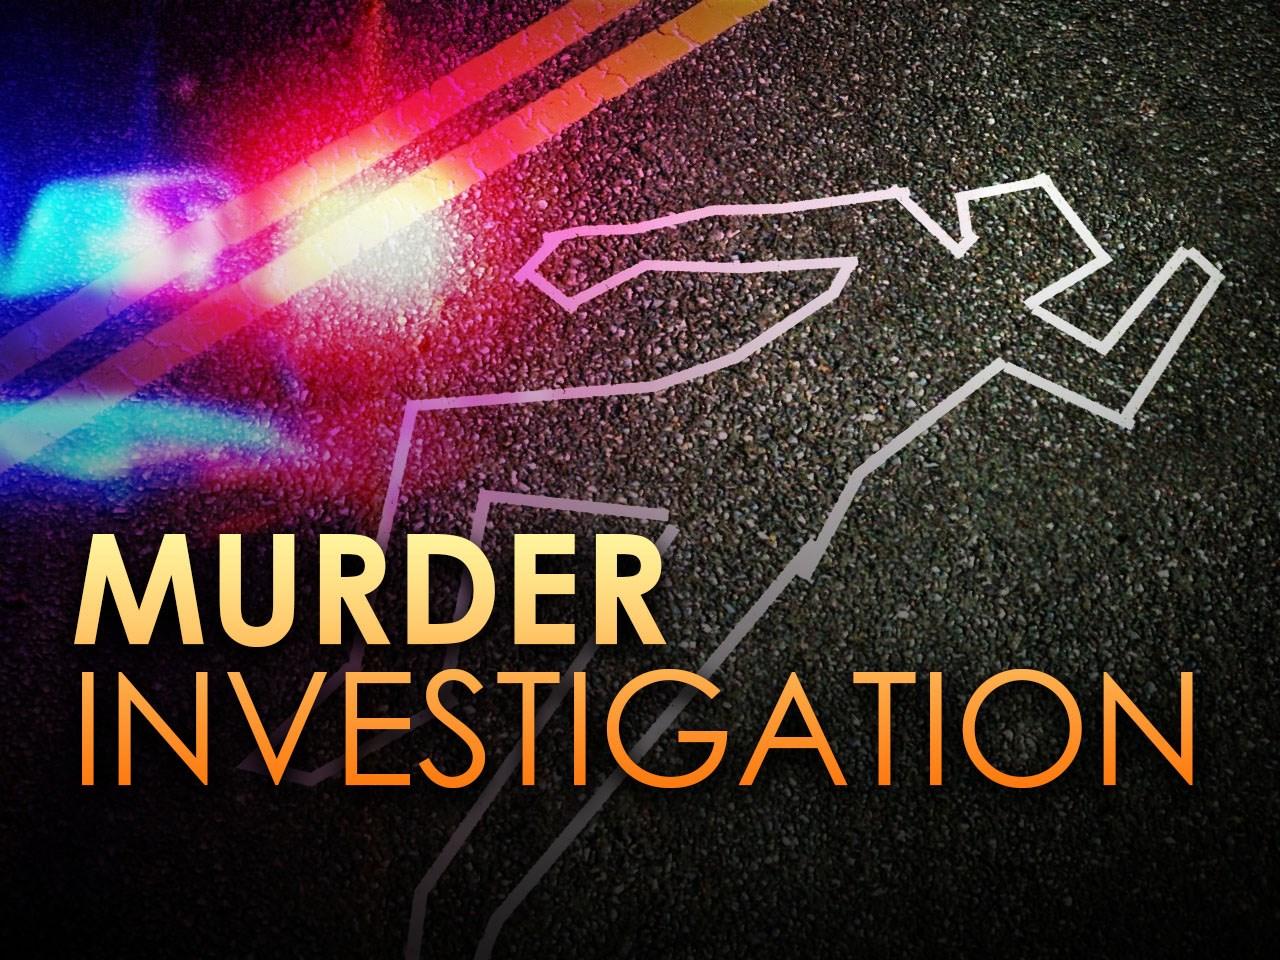 MURDER INVESTIGATION_1545027672287.jpg.jpg